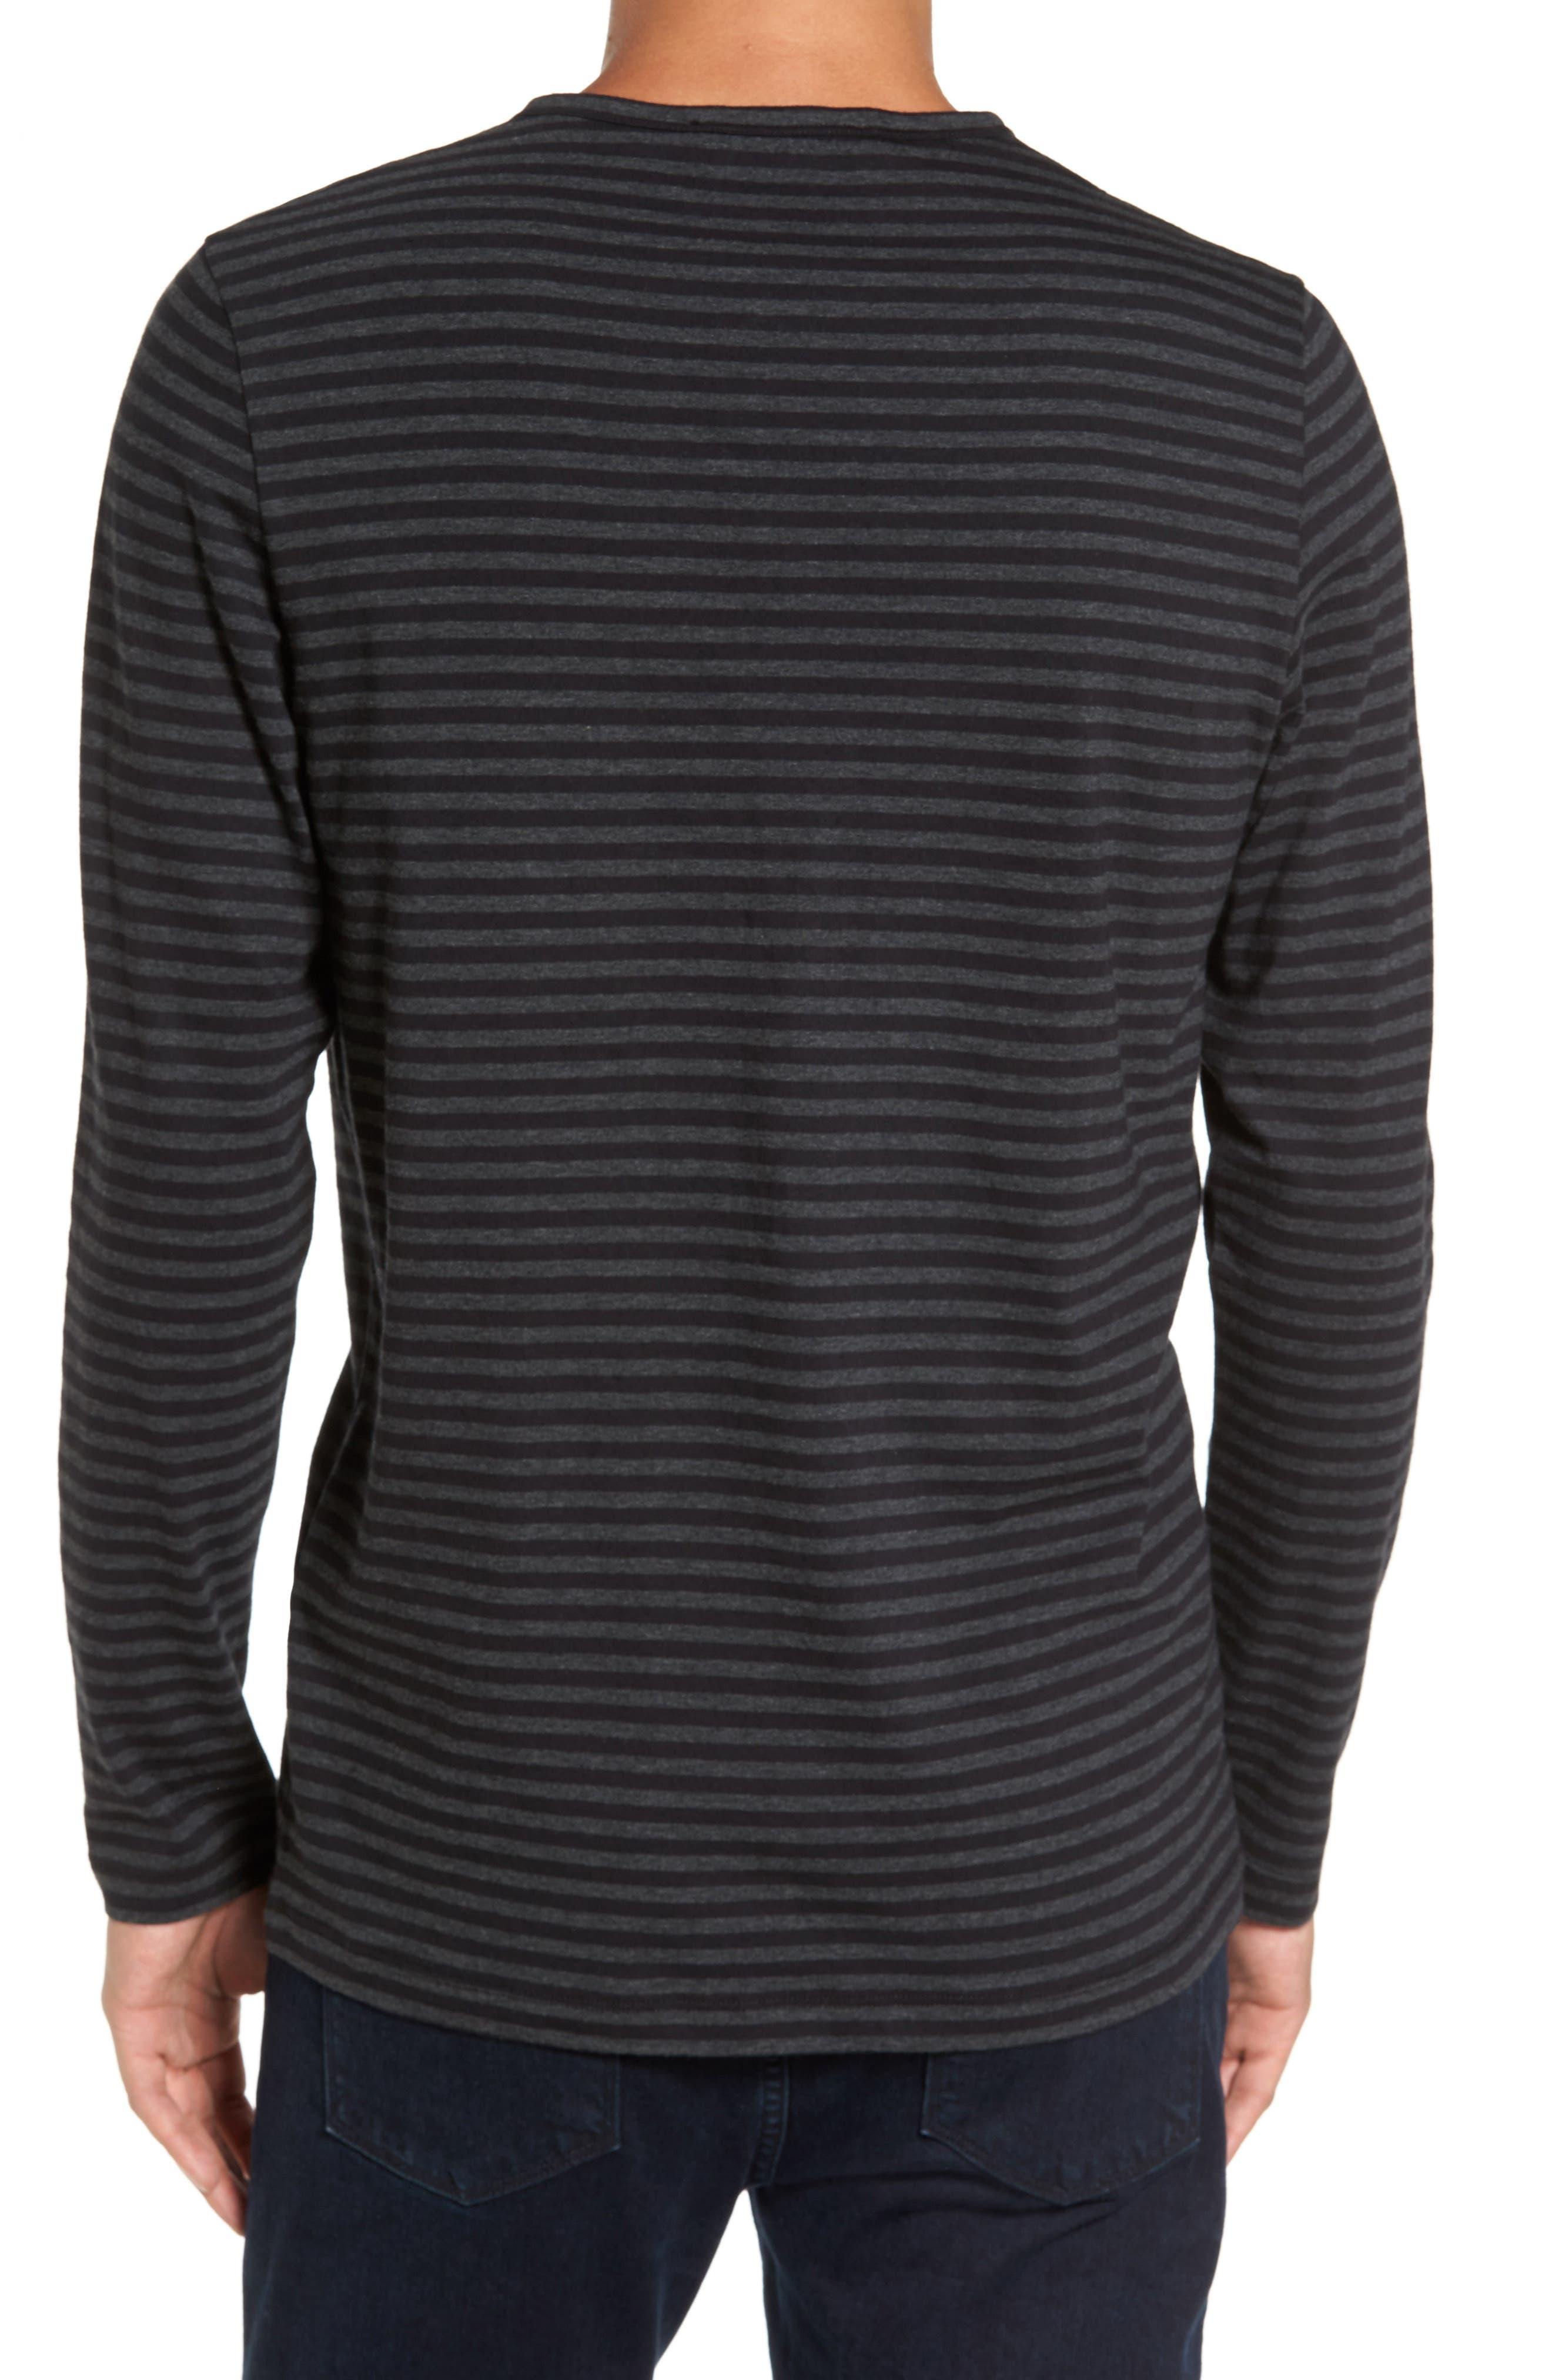 Long Sleeve Henley T-Shirt,                             Alternate thumbnail 2, color,                             Black/ Charcoal Stripe